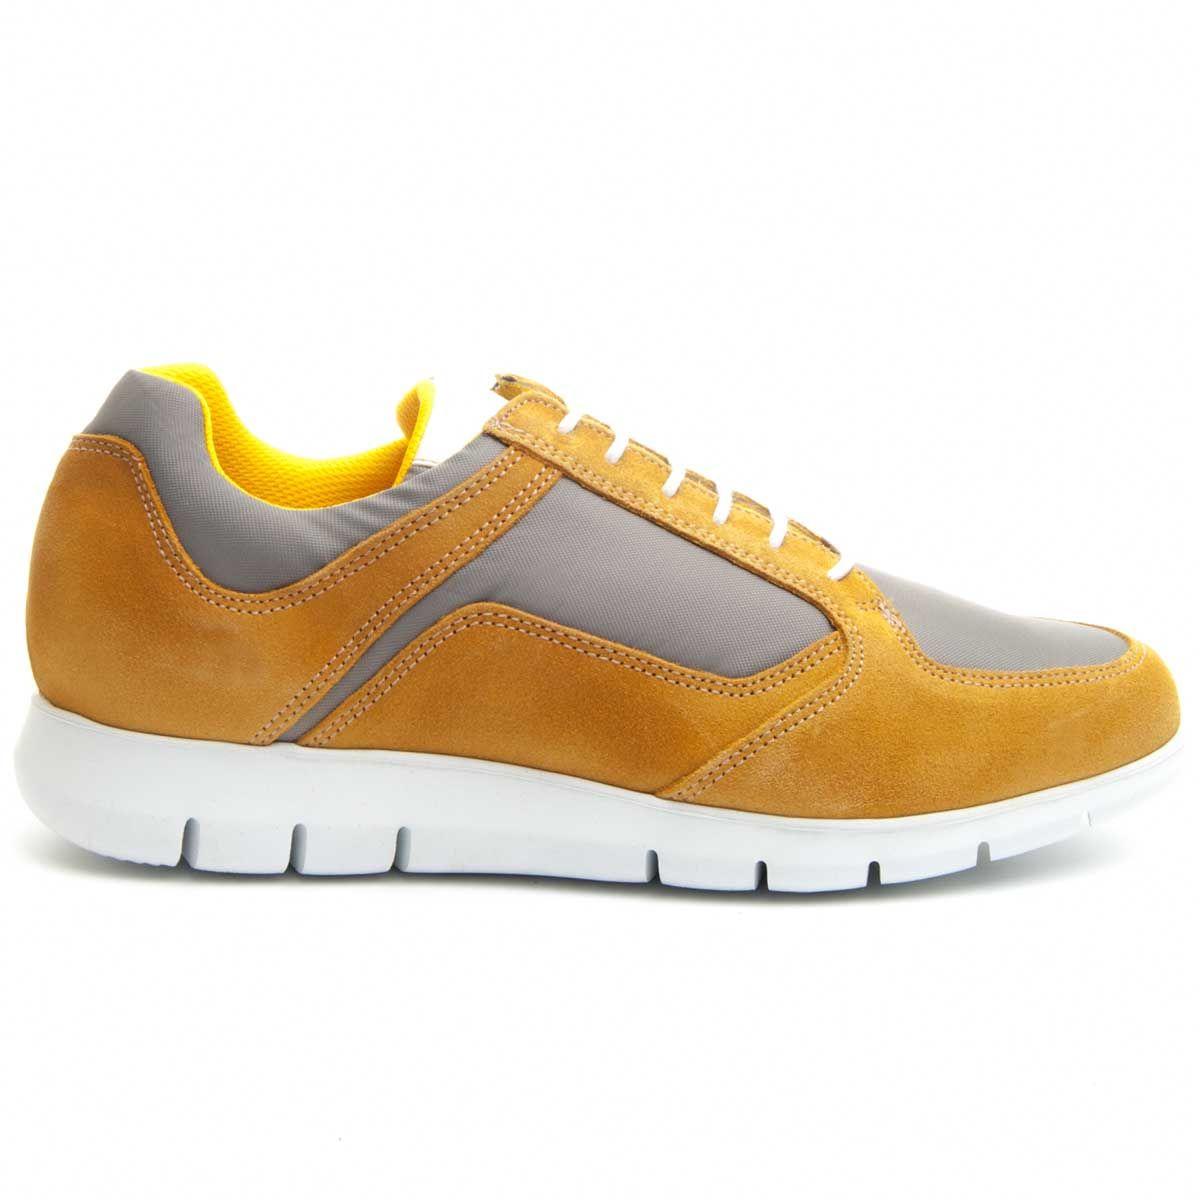 Purapiel Cleated Sole Sneaker in Yellow